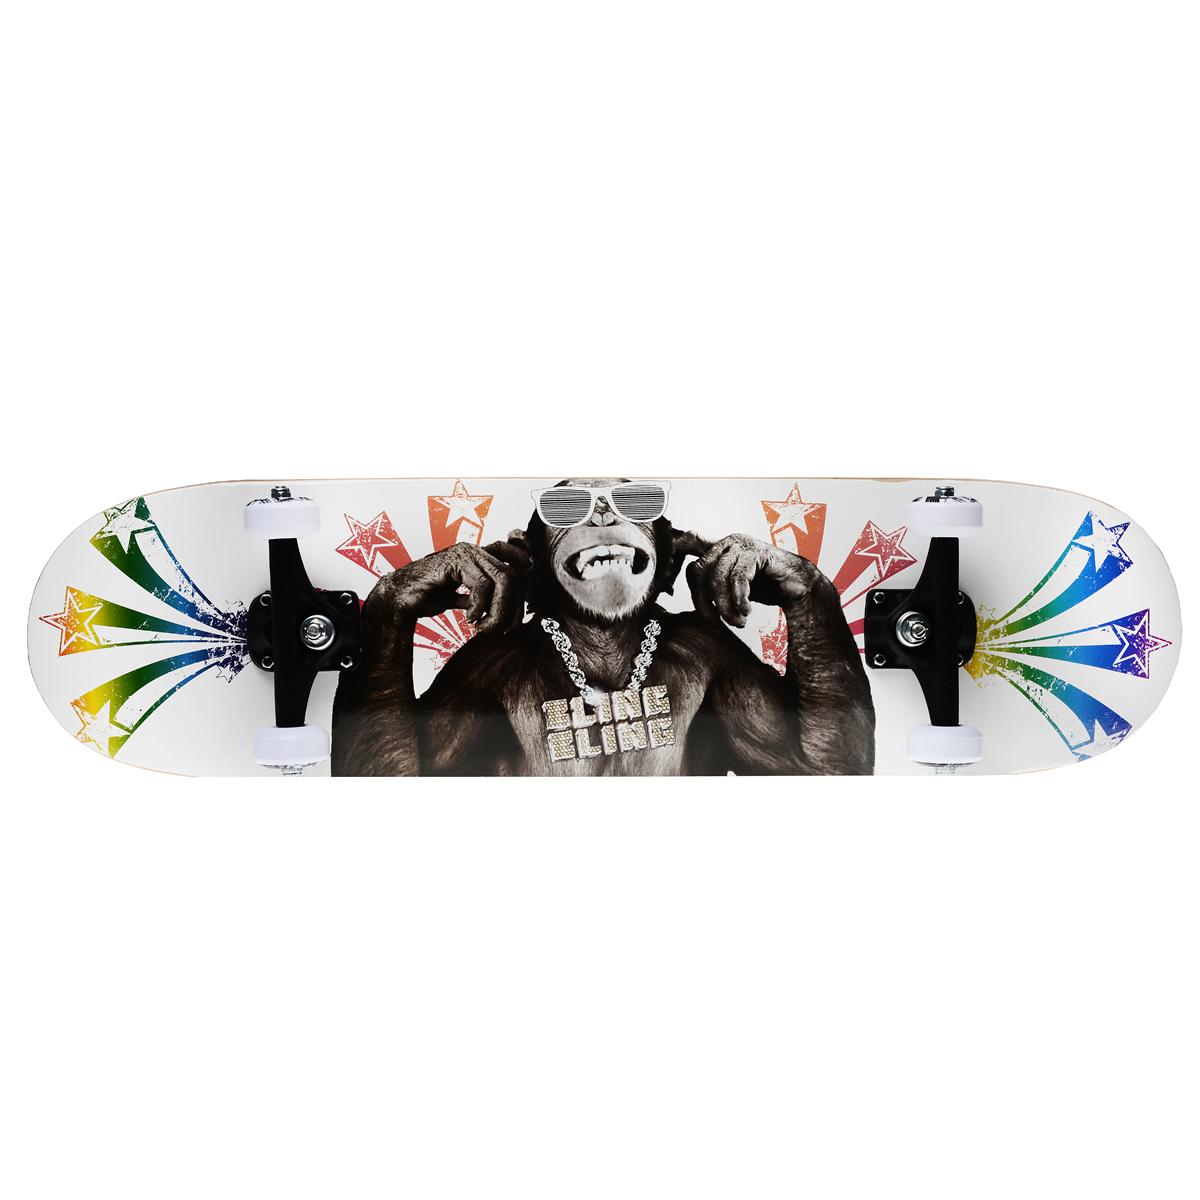 "Скейтборд MaxCity ""King Kong"", цветной принт, дека 79 см х 20 см"